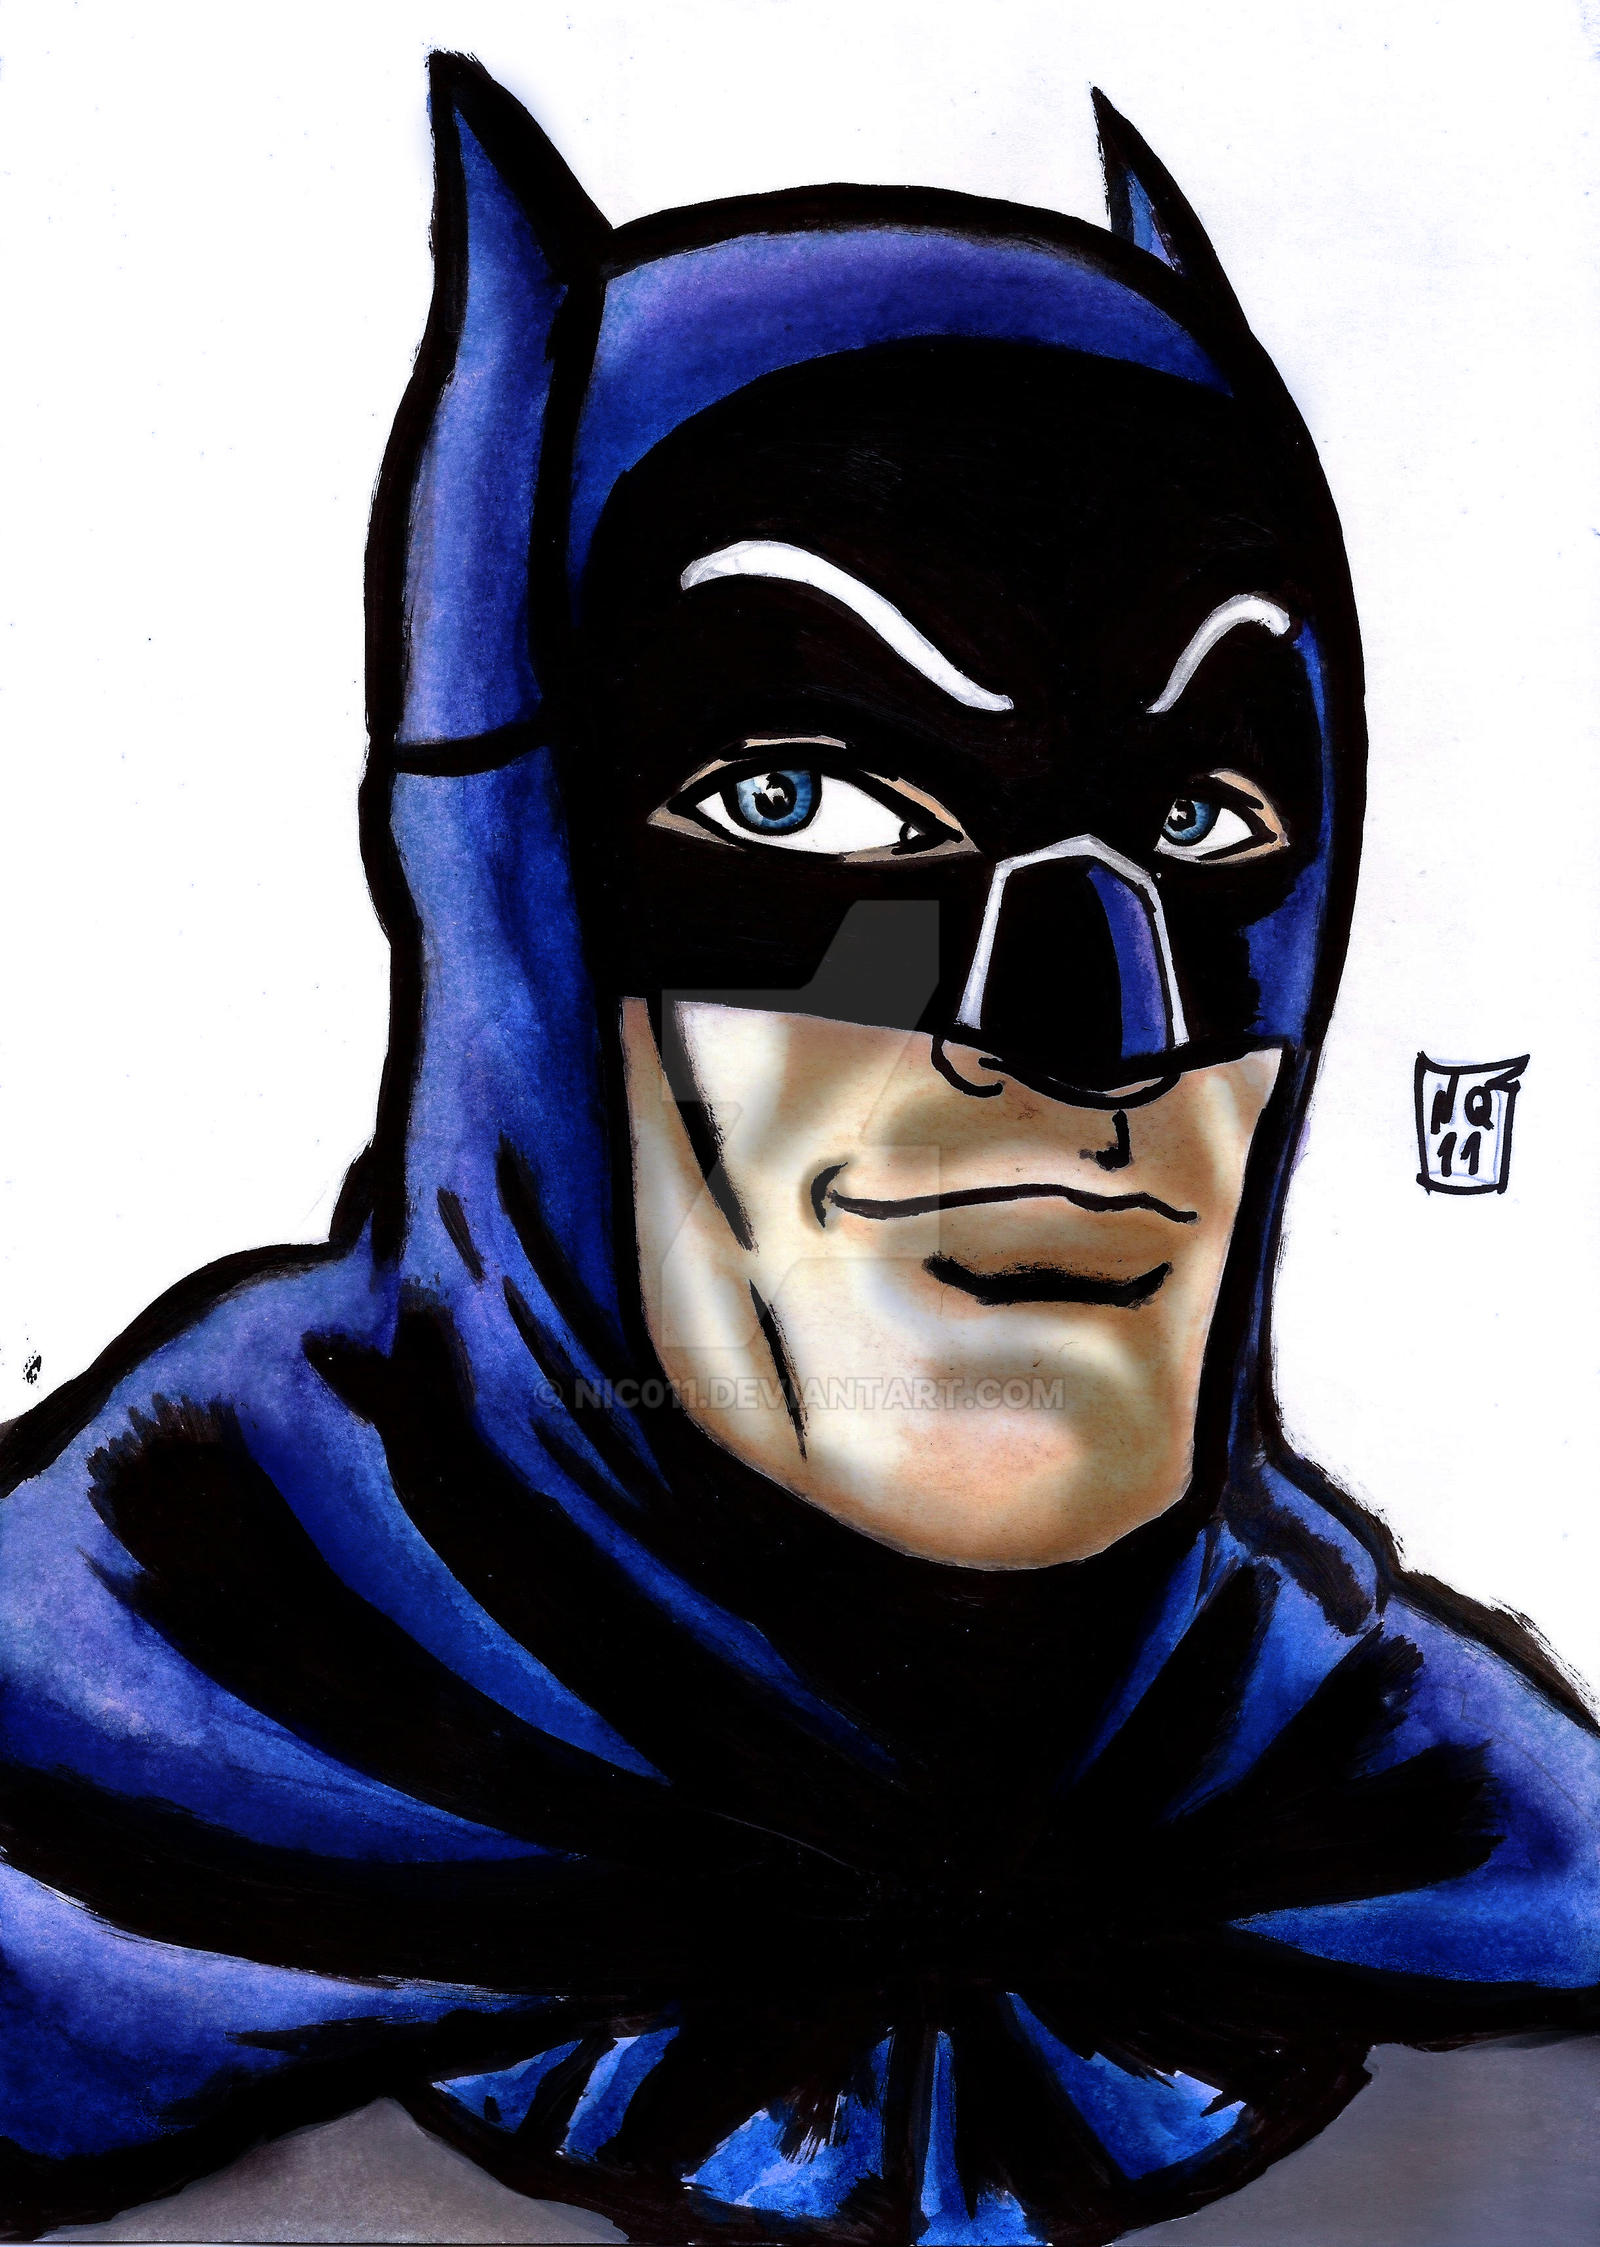 Batman'66 by nic011